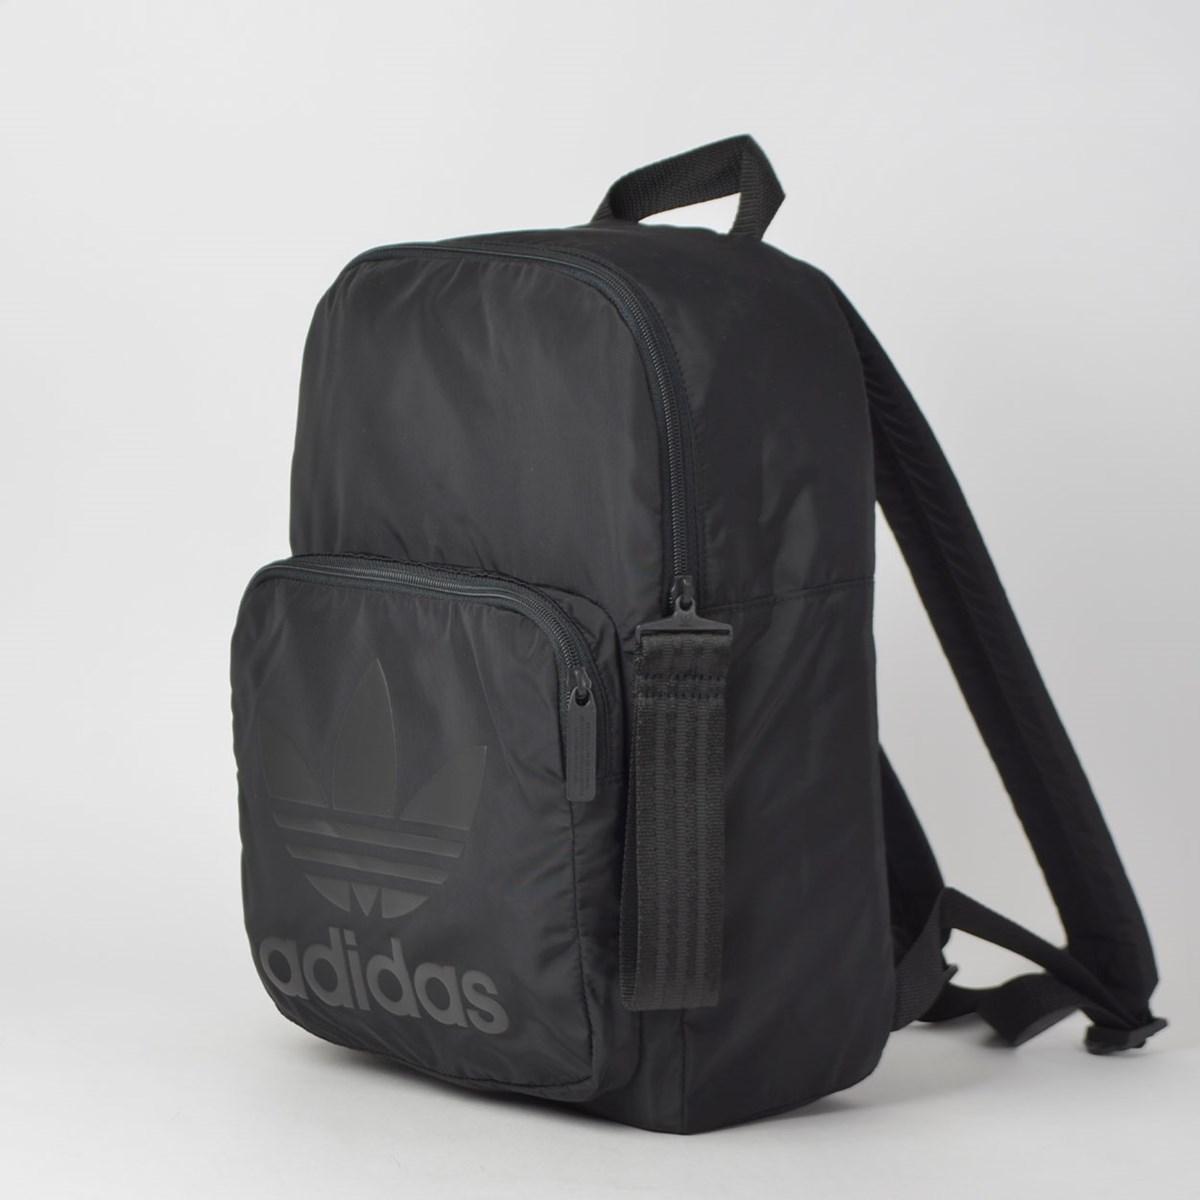 Mochila Adidas Backpack M Preto DV0214